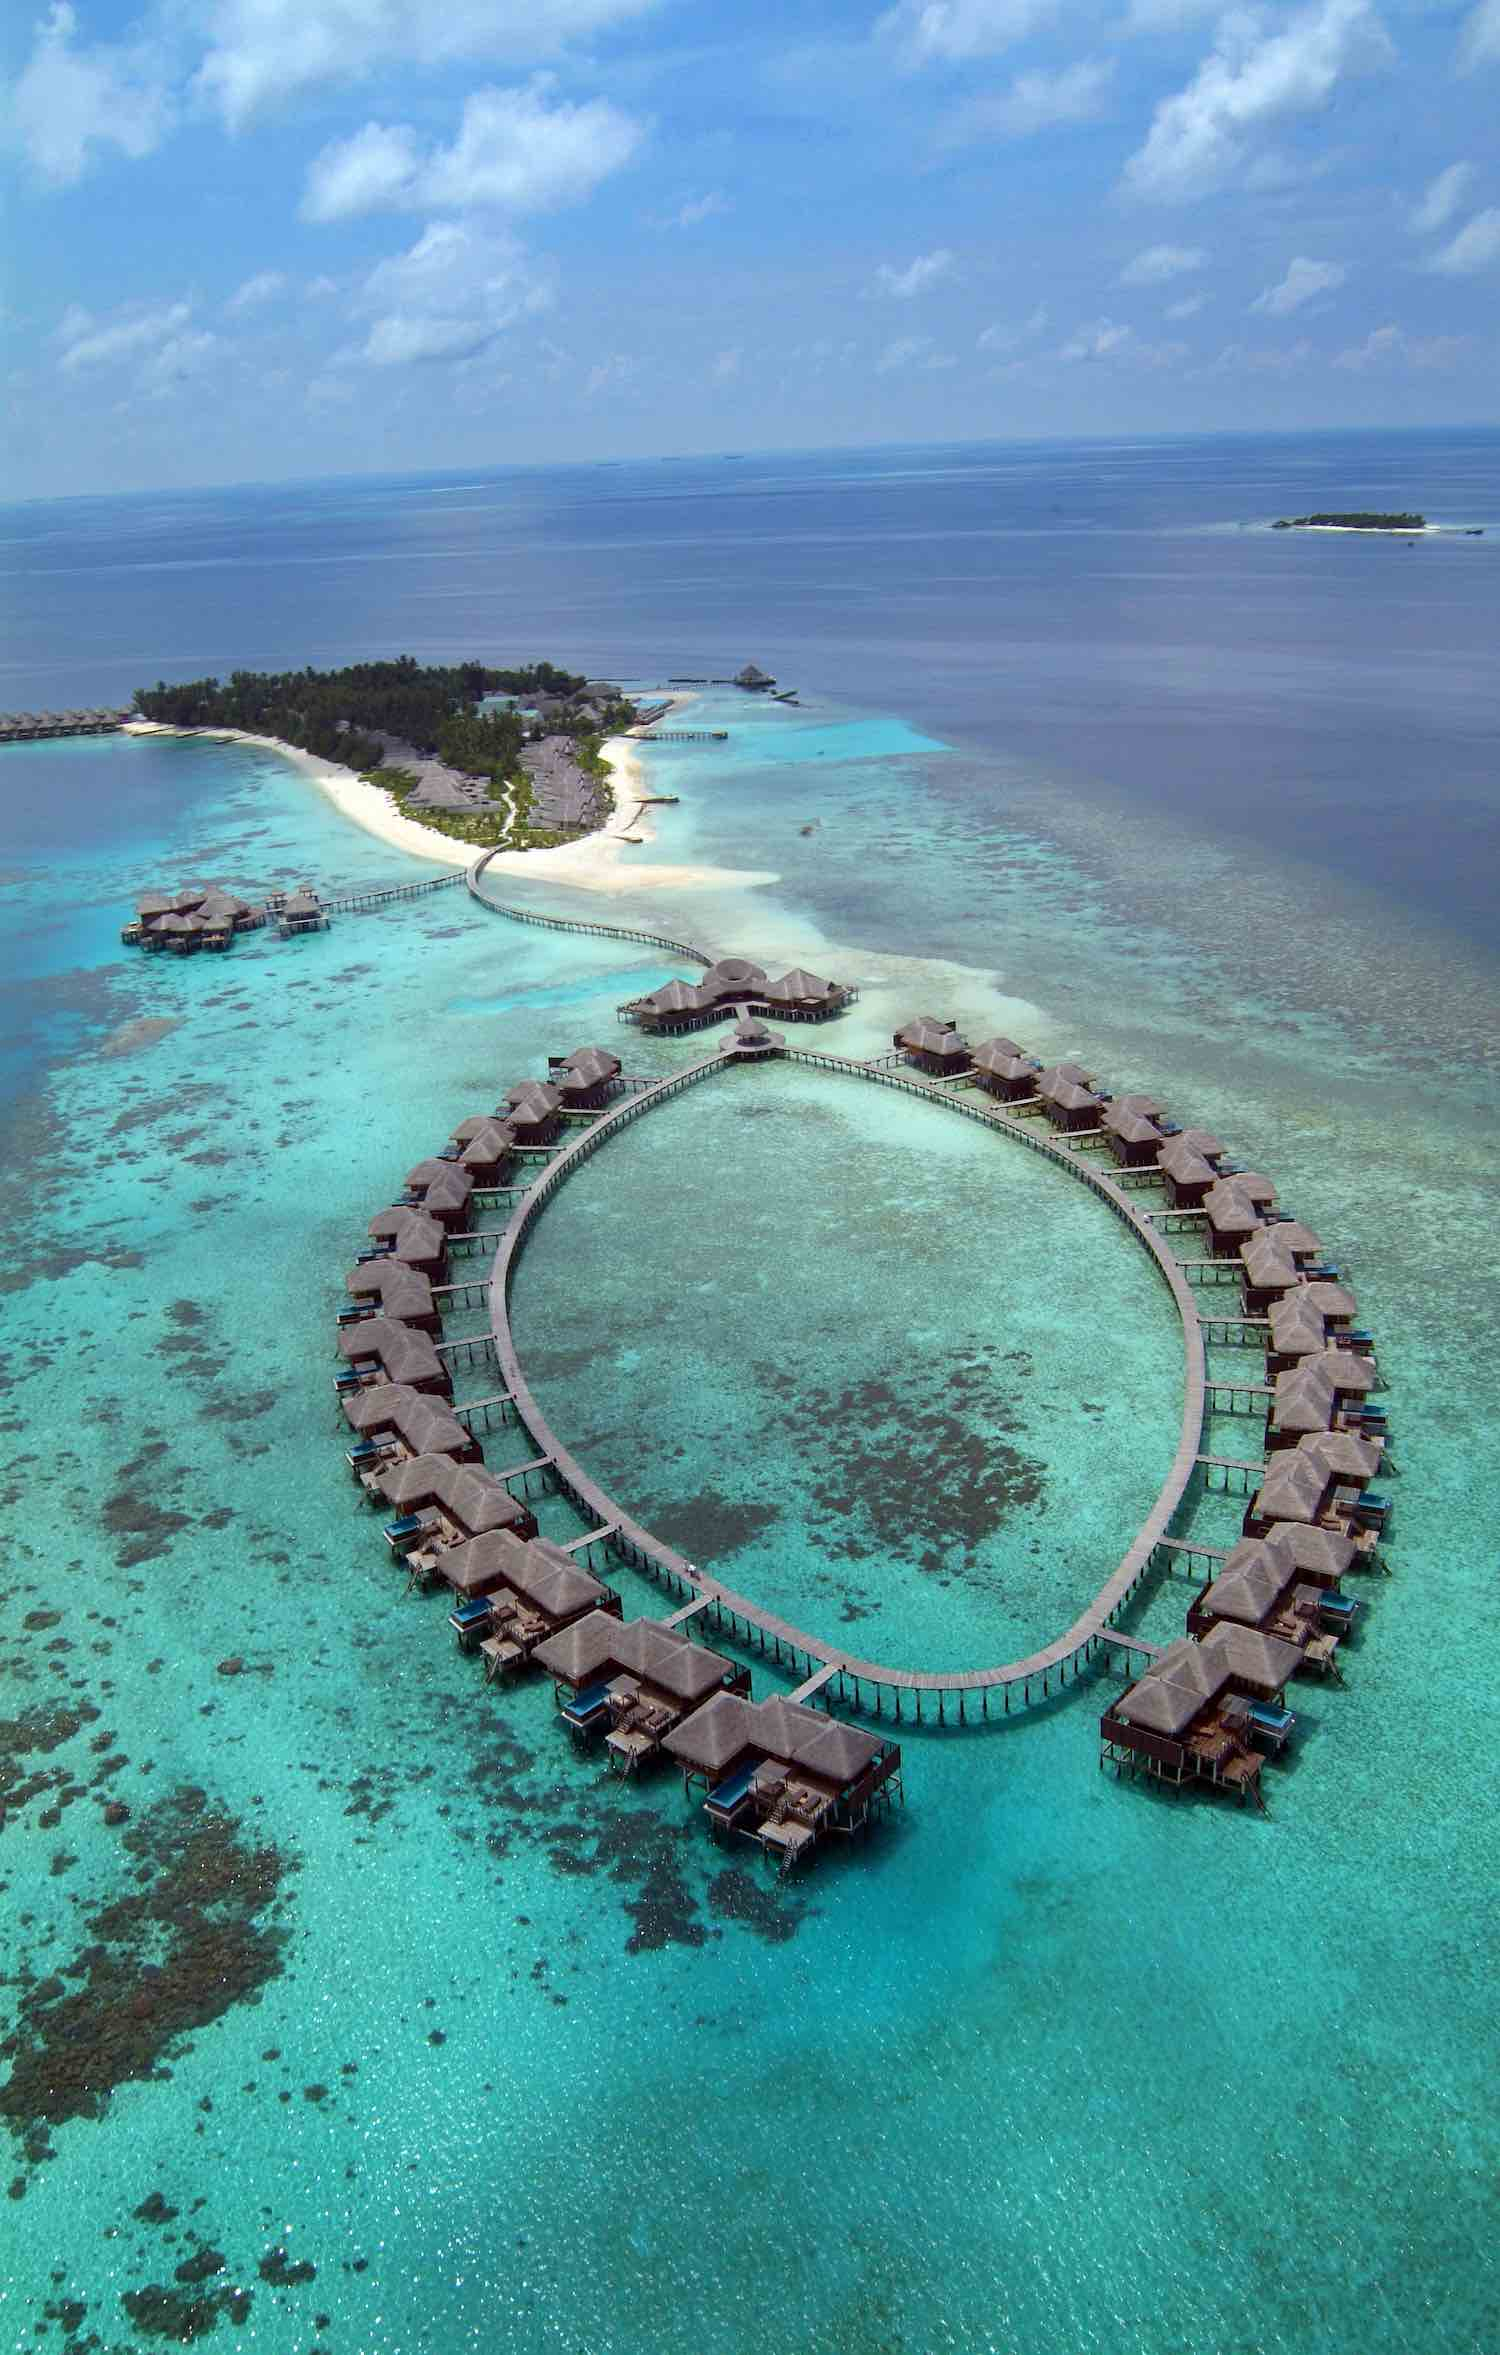 maldives-coco-bodu-hithi-escape-water-villa-holiday-honeymoon-vacation-invite-to-paradise.jpg